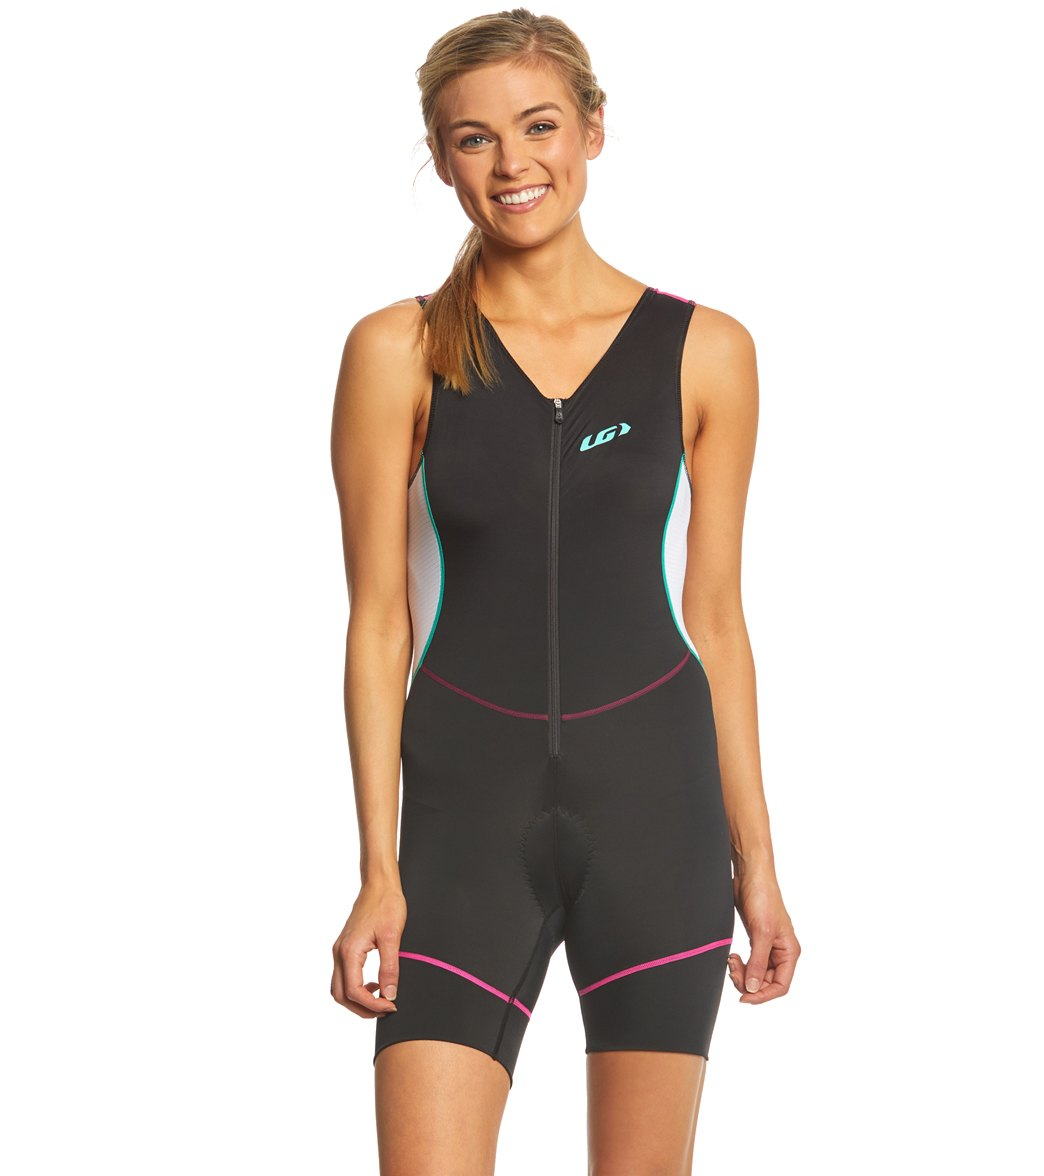 e9b394e0f Louis Garneau Women s Comp Triathlon Suit at SwimOutlet.com - Free Shipping